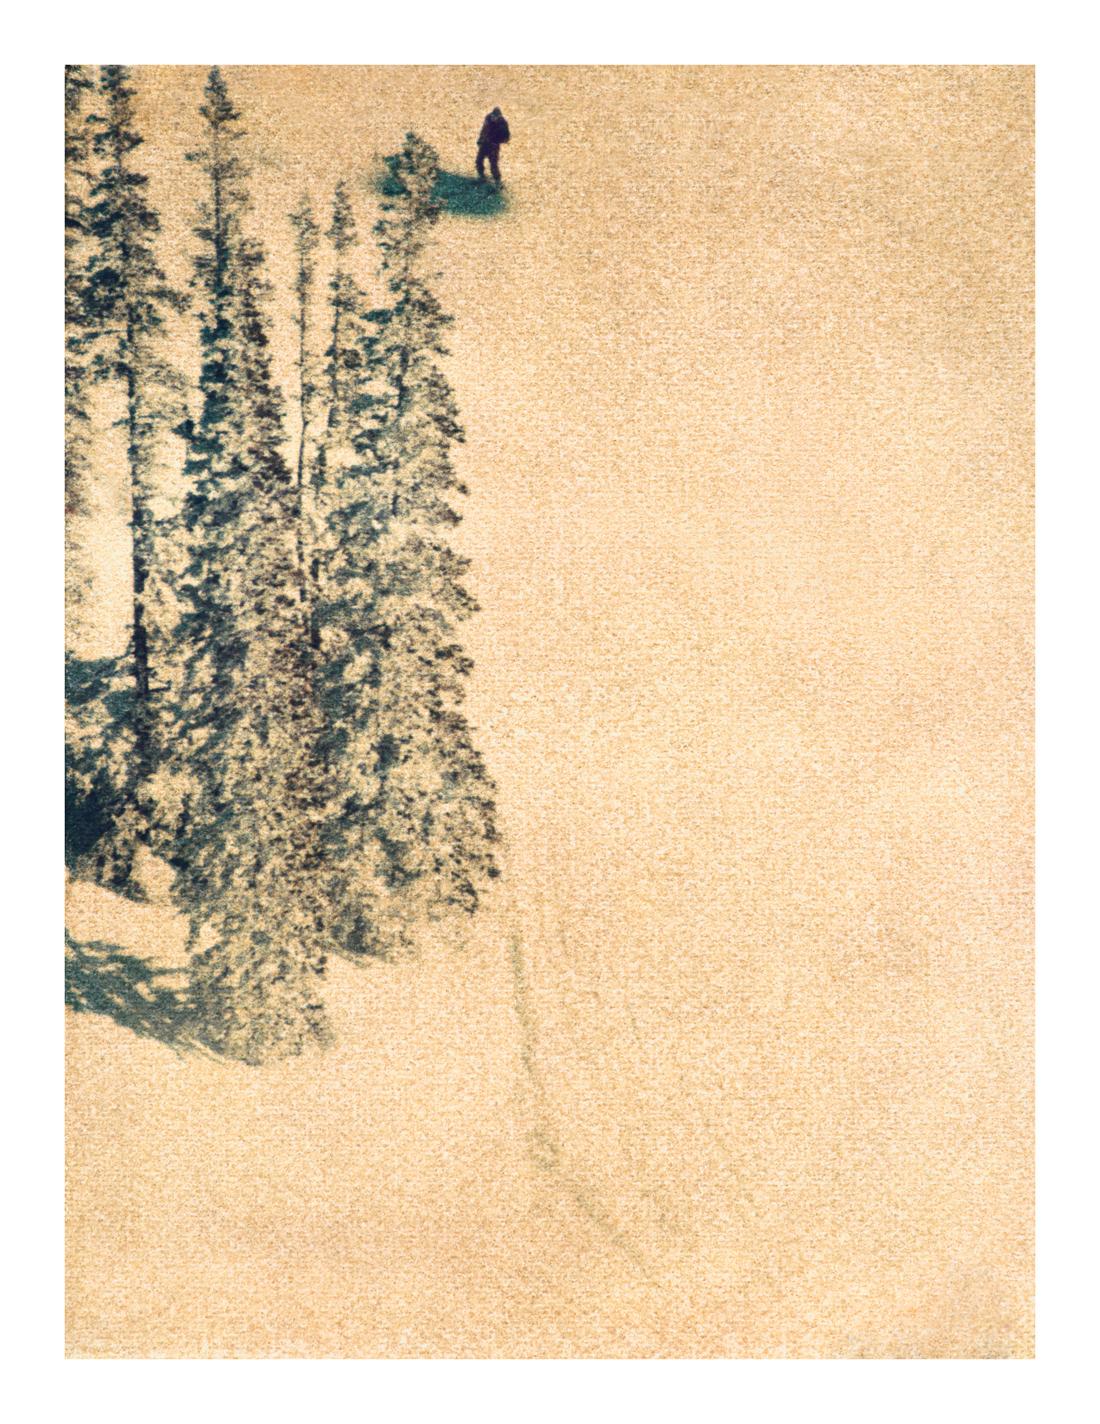 Aspen #7, 2007 (1996)